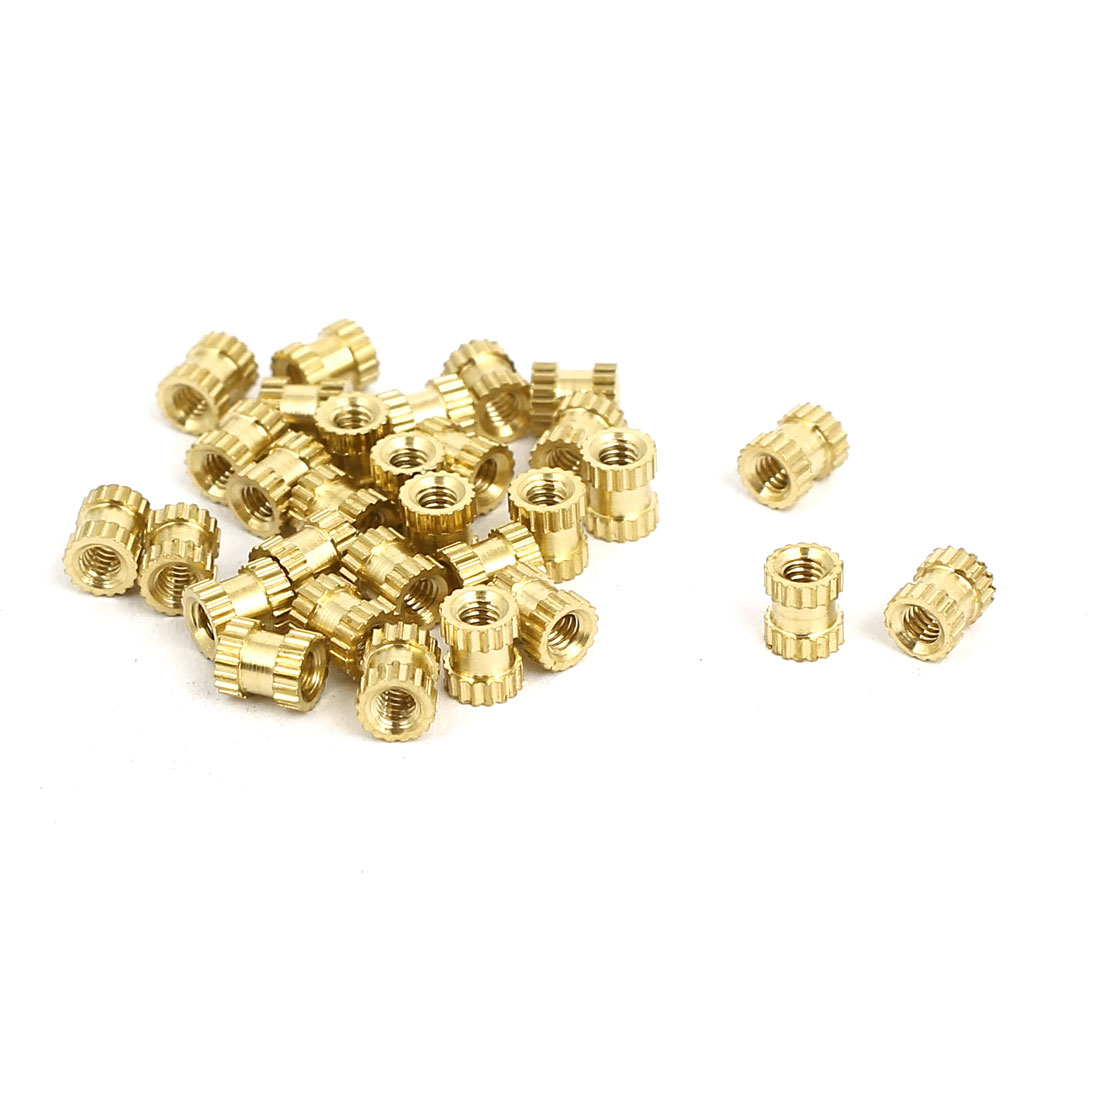 M2x4mmx3.5mm Brass Knurled Threaded Nut Insert Embedded Nuts Gold Tone 30pcs